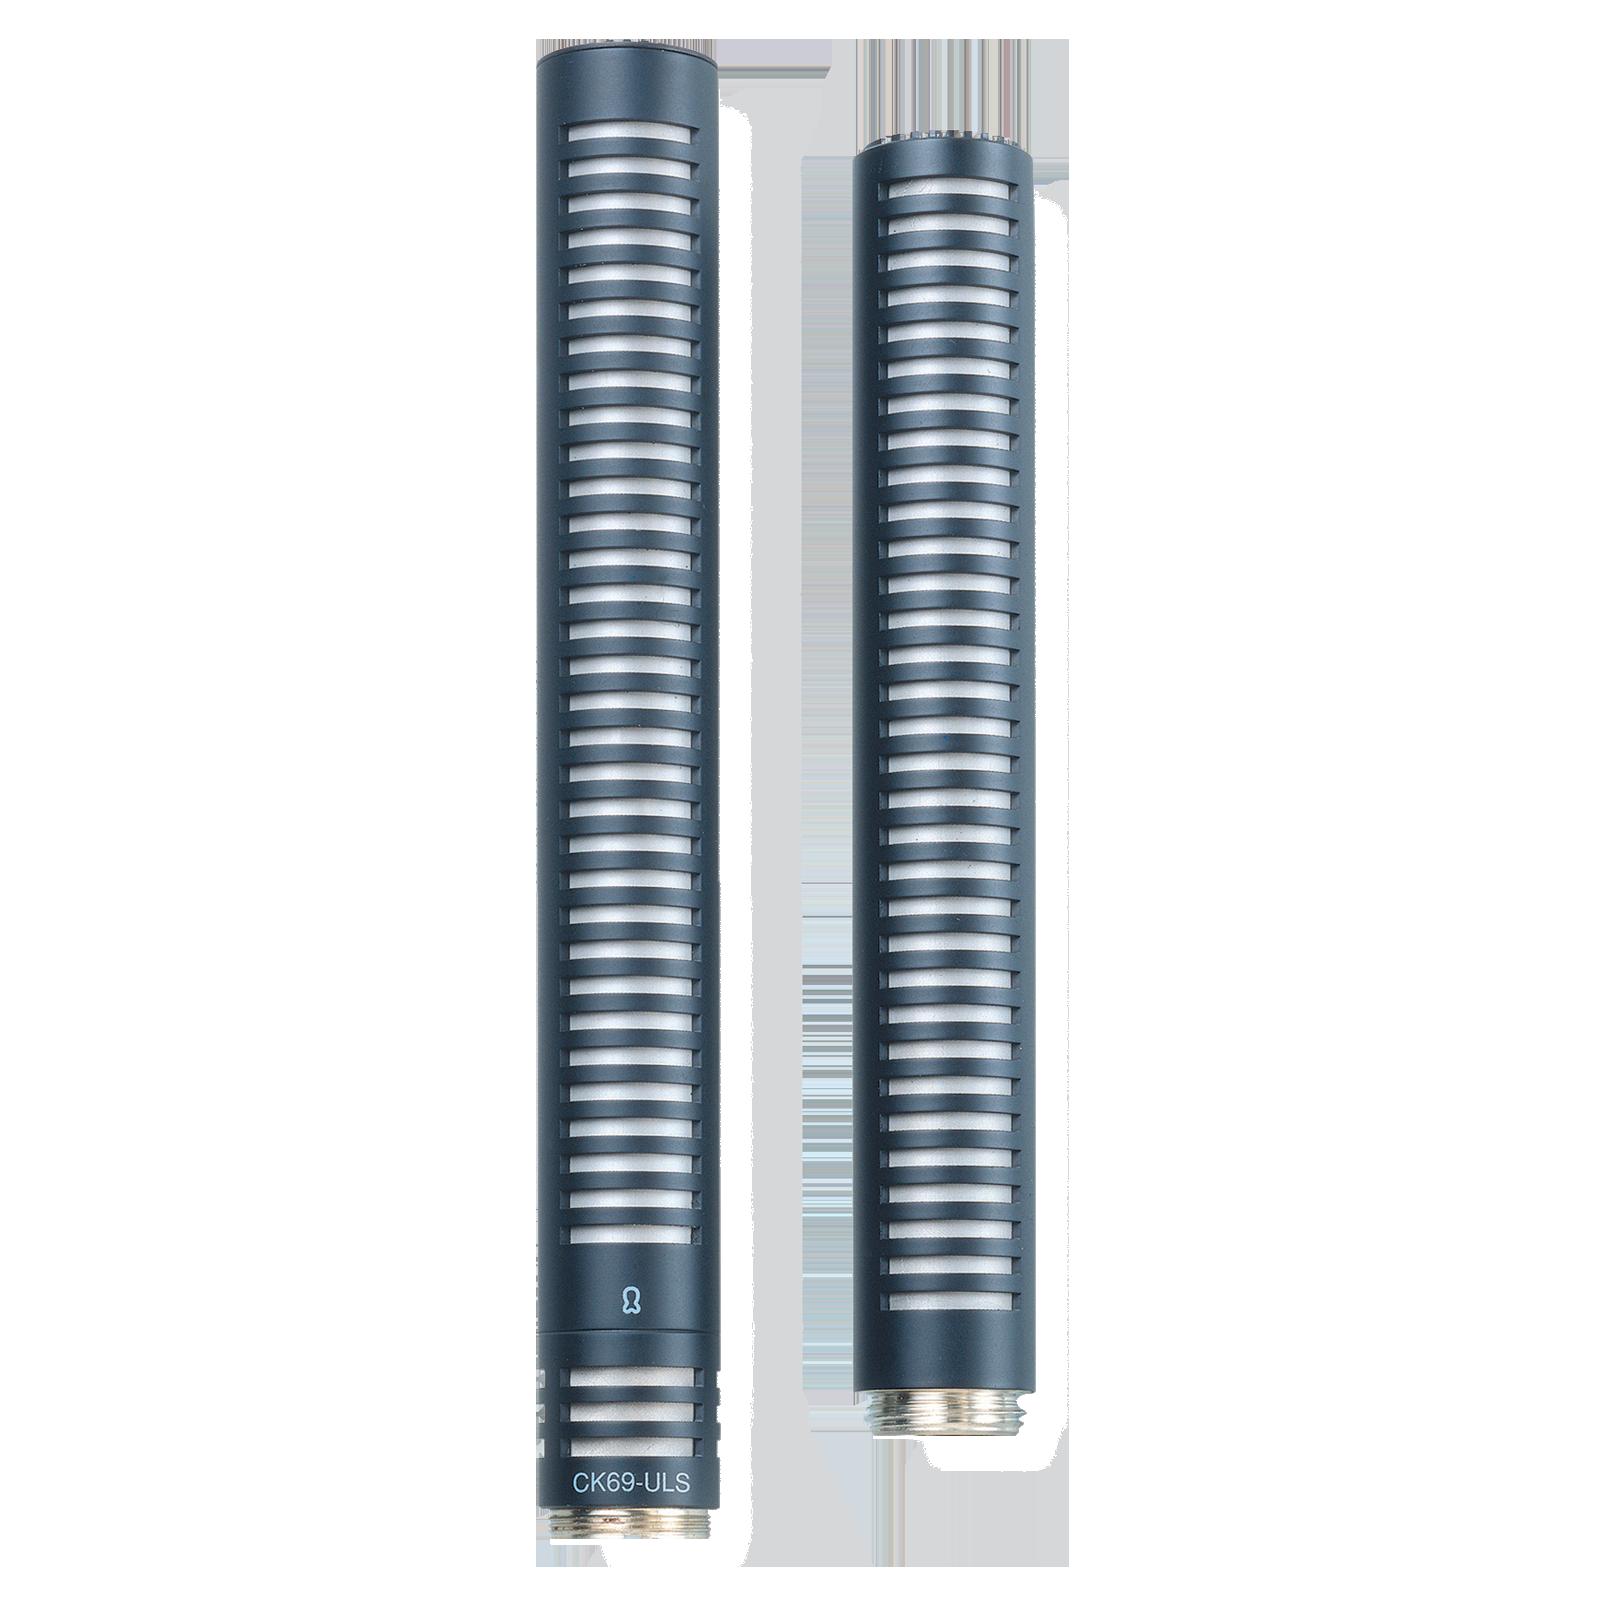 CK69 ULS - Black - Reference small condenser microphone shotgun capsule - Hero